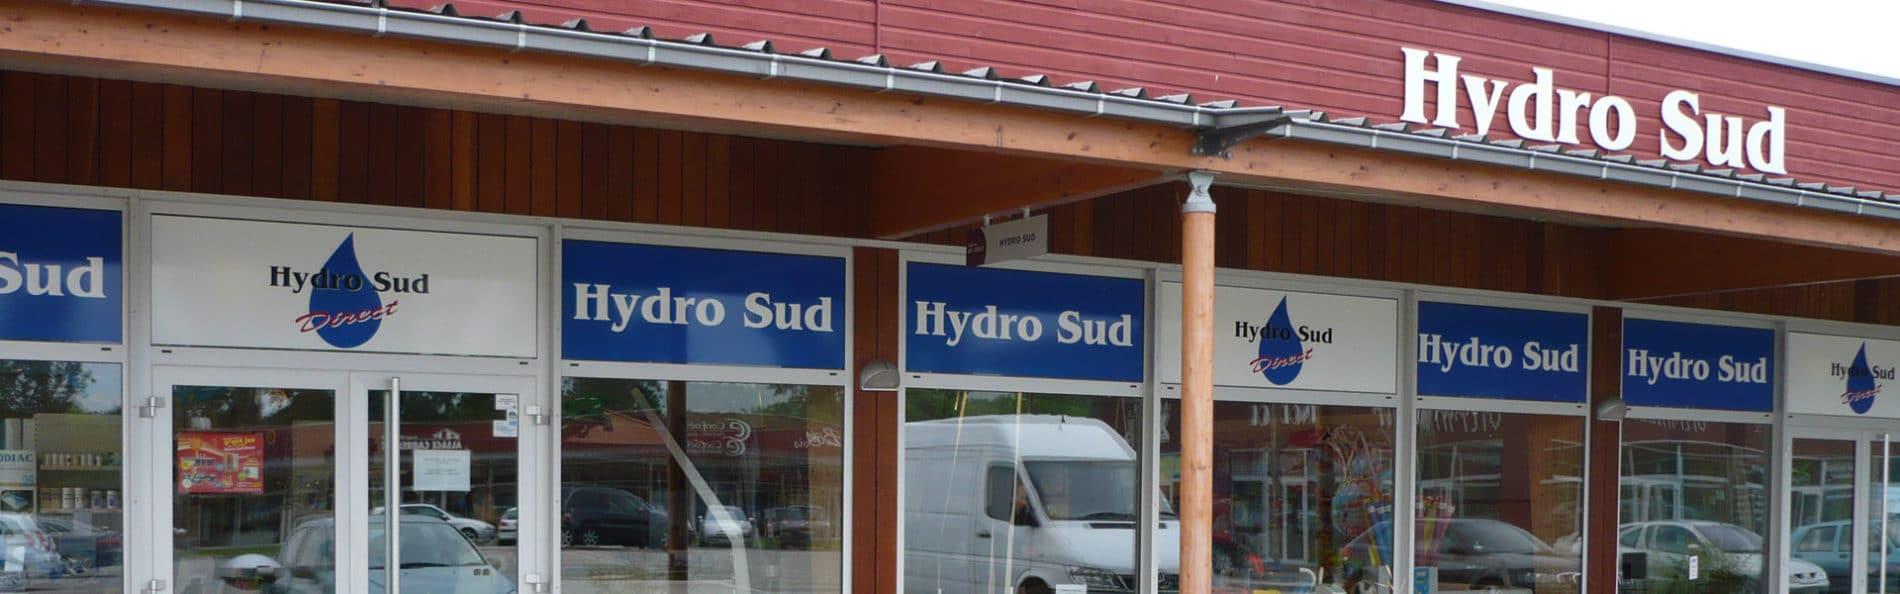 Hydro Sud Mulhouse